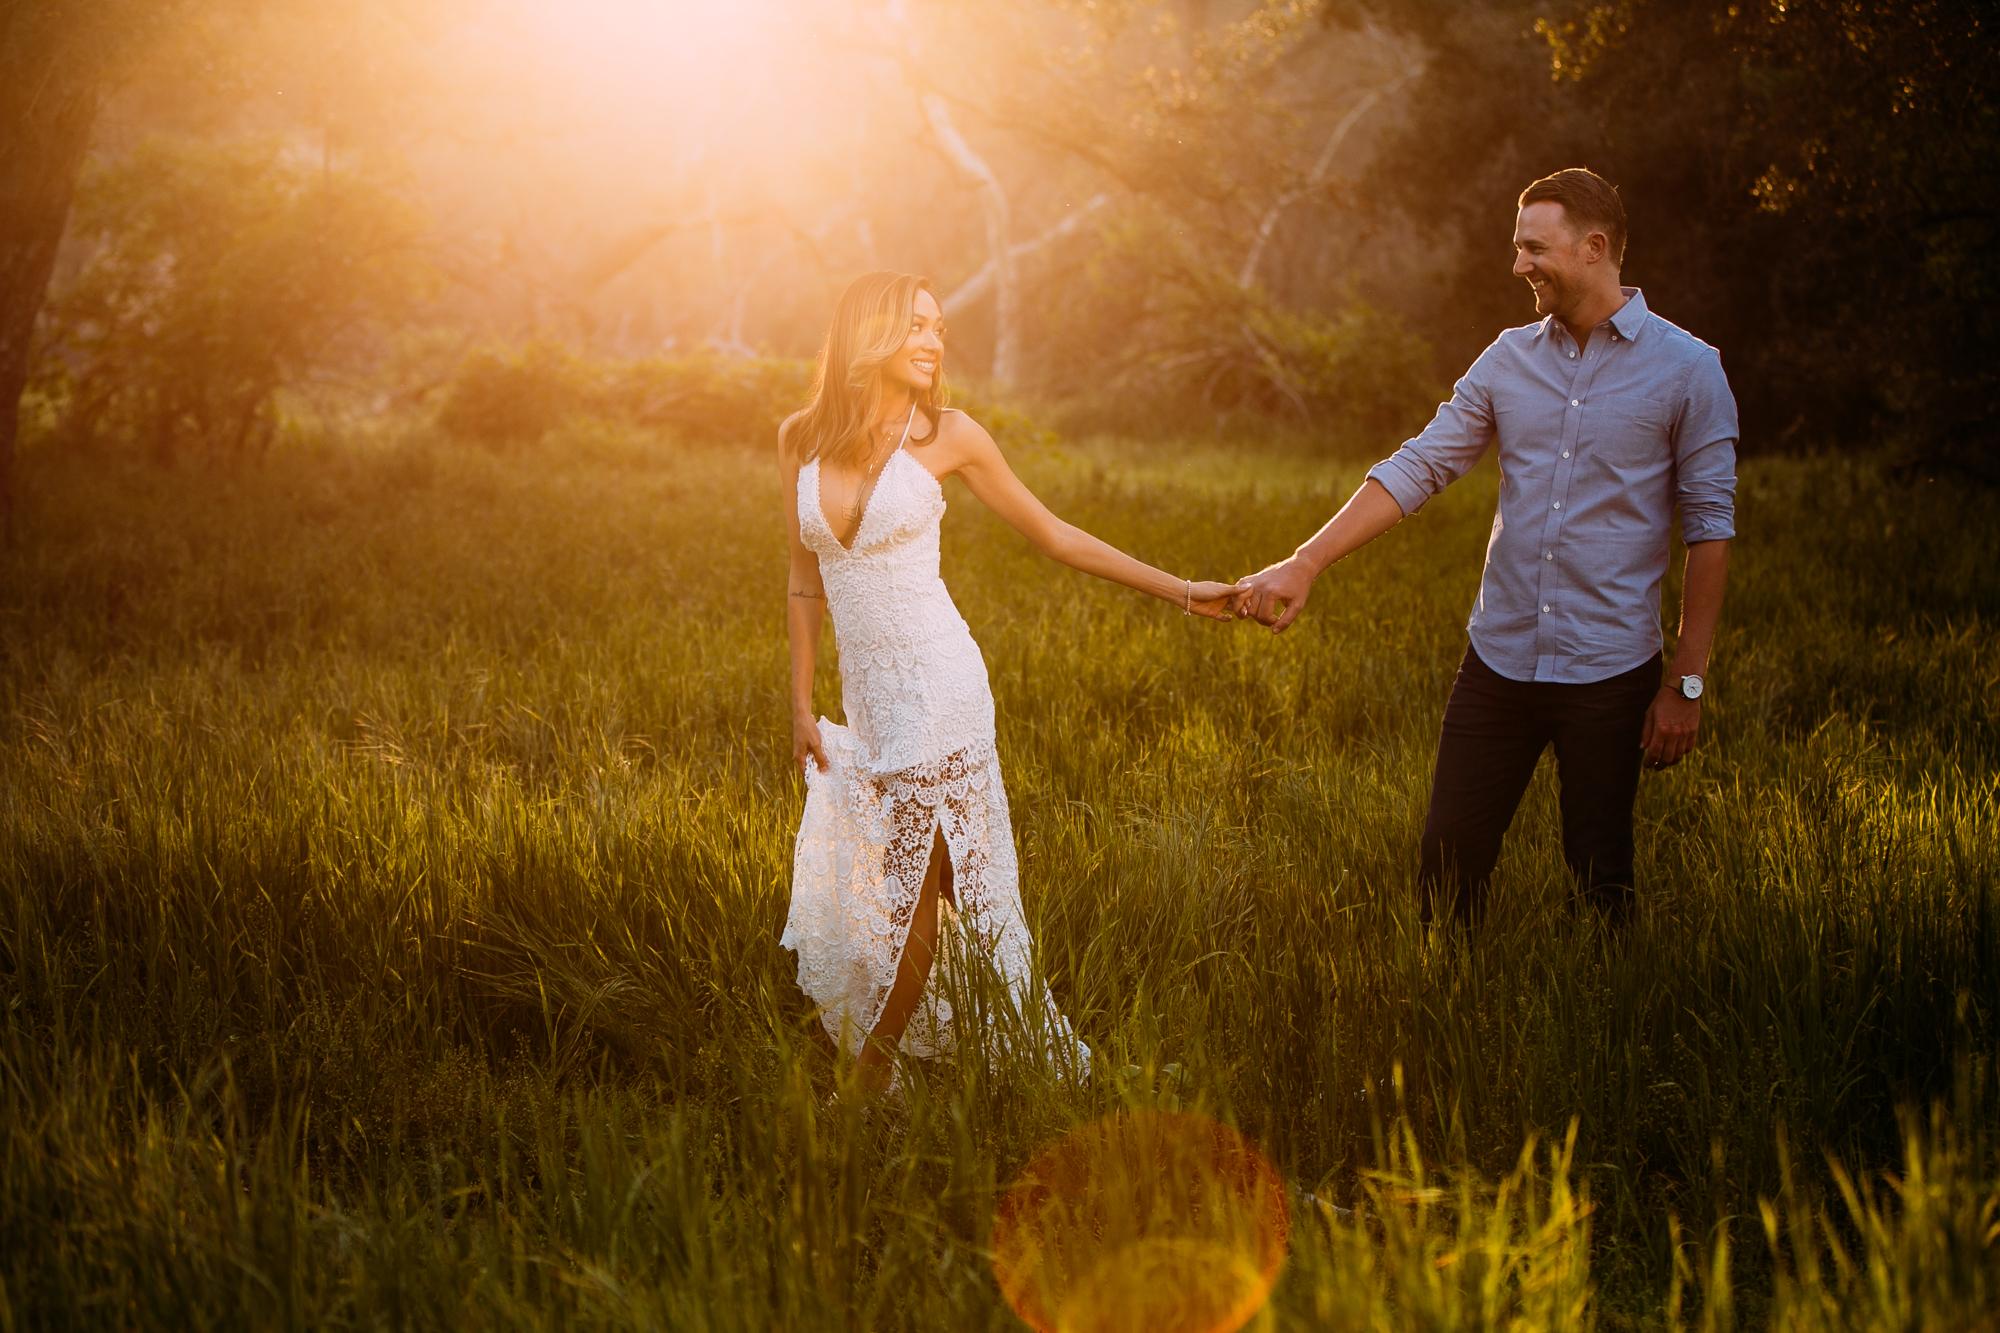 2017.3.11_Caspers-Park_Orange-County-Engagement-Sarah-Mack-Photo  130.jpg